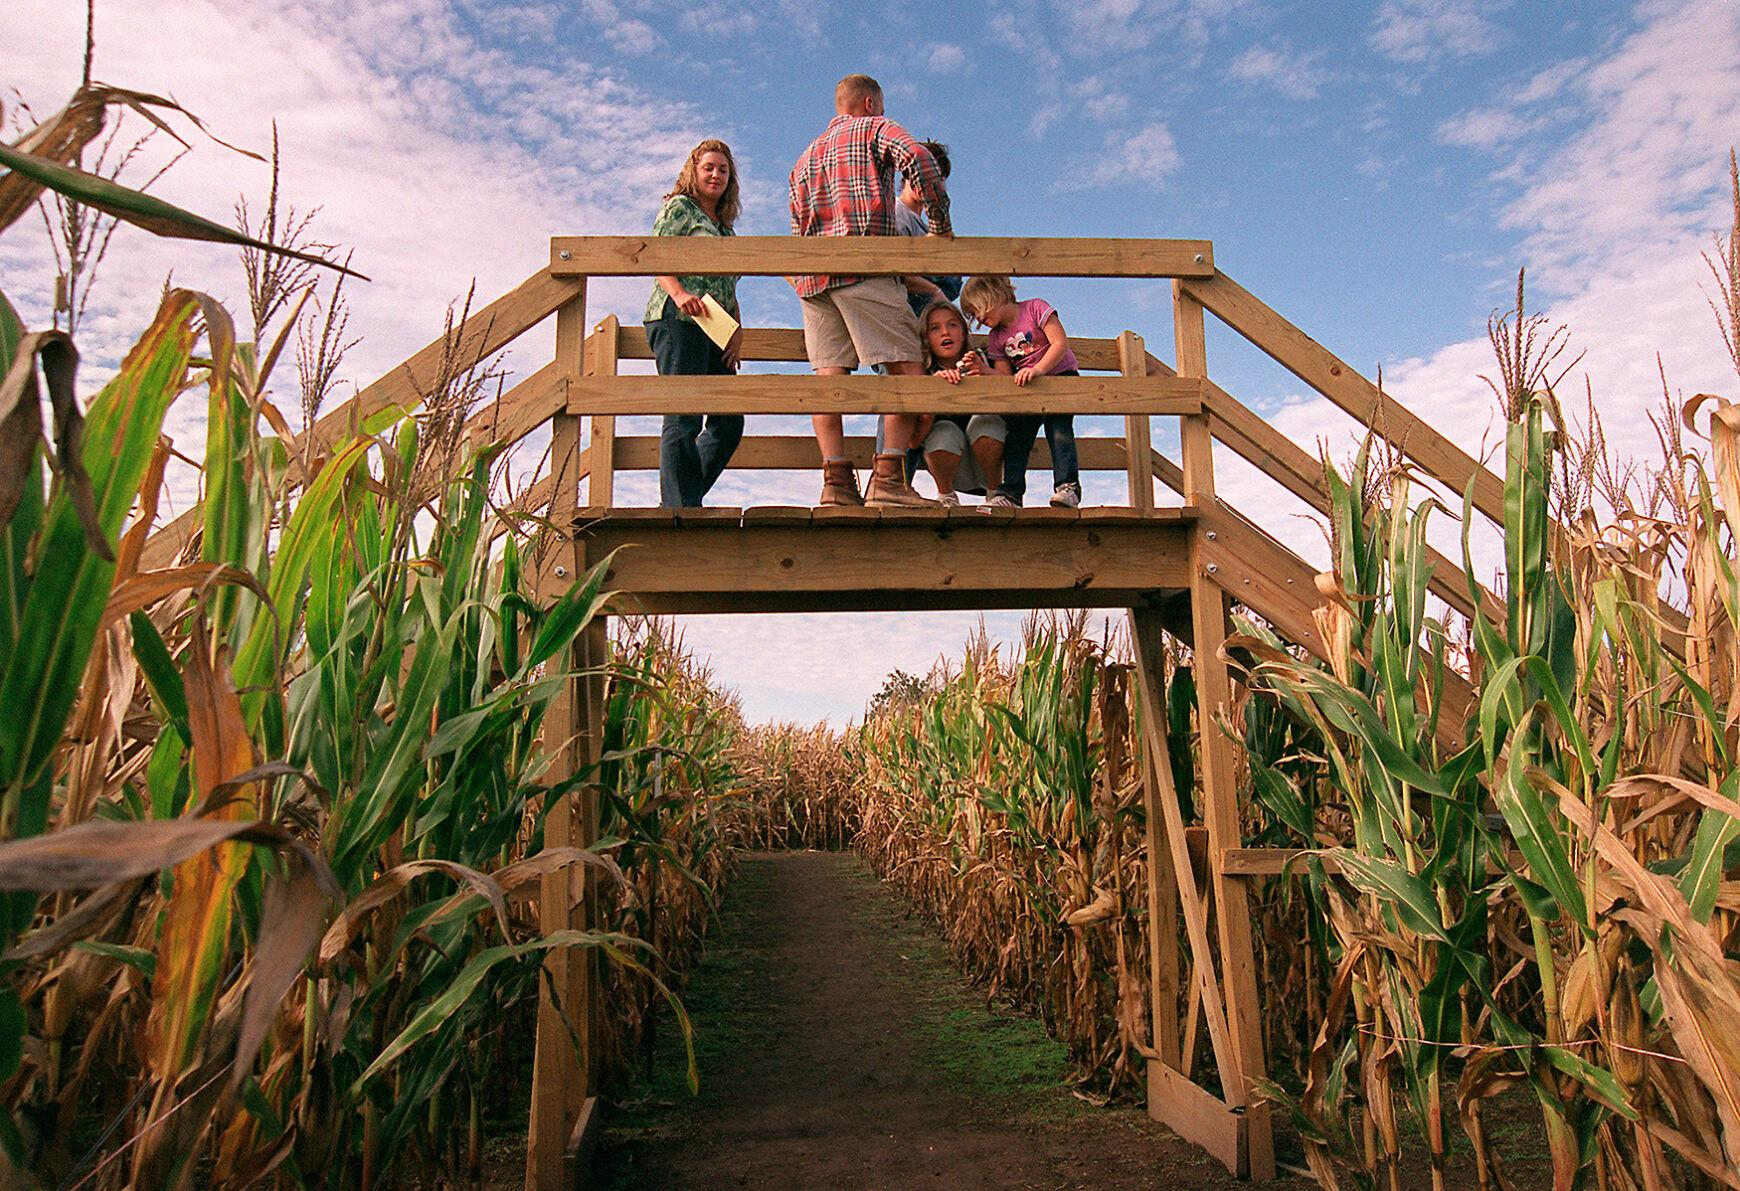 Amanda Gentles, Eric Wiedemann, Lisa Bauer, Audrey Wiedemann, and Abbigale Gentles stand atop a bridge in the middle of Shryock Farm's Spirit of American corn maze